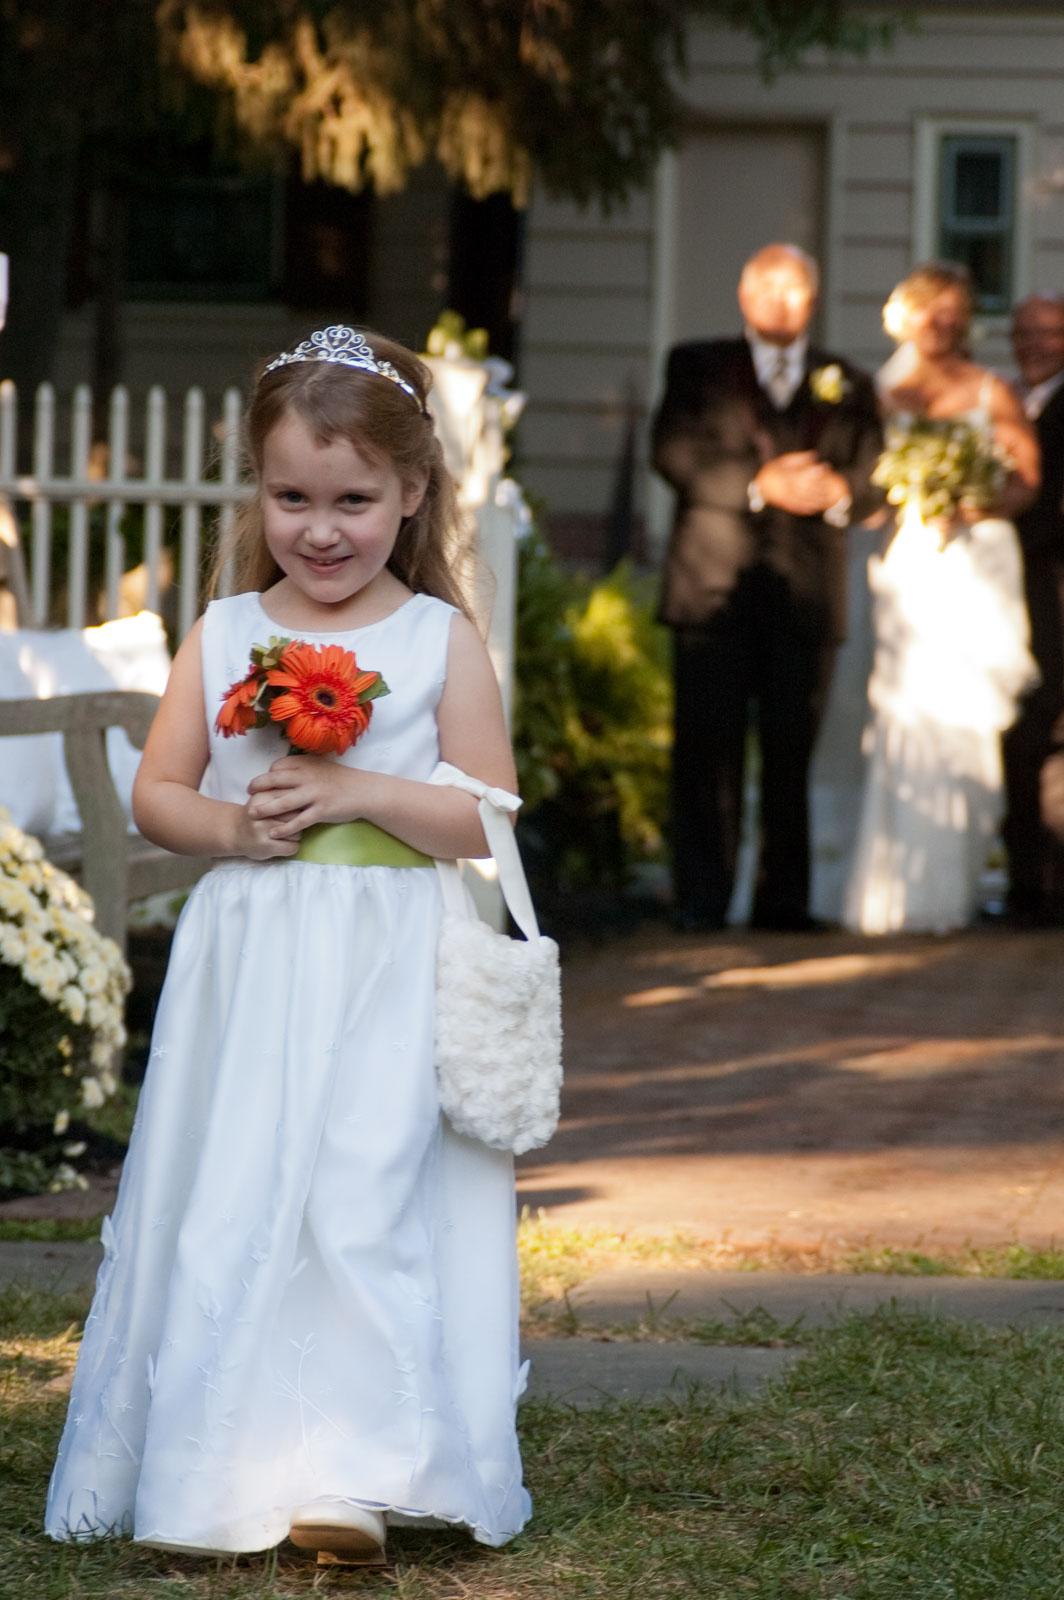 Wedding031_DSC_0044.jpg